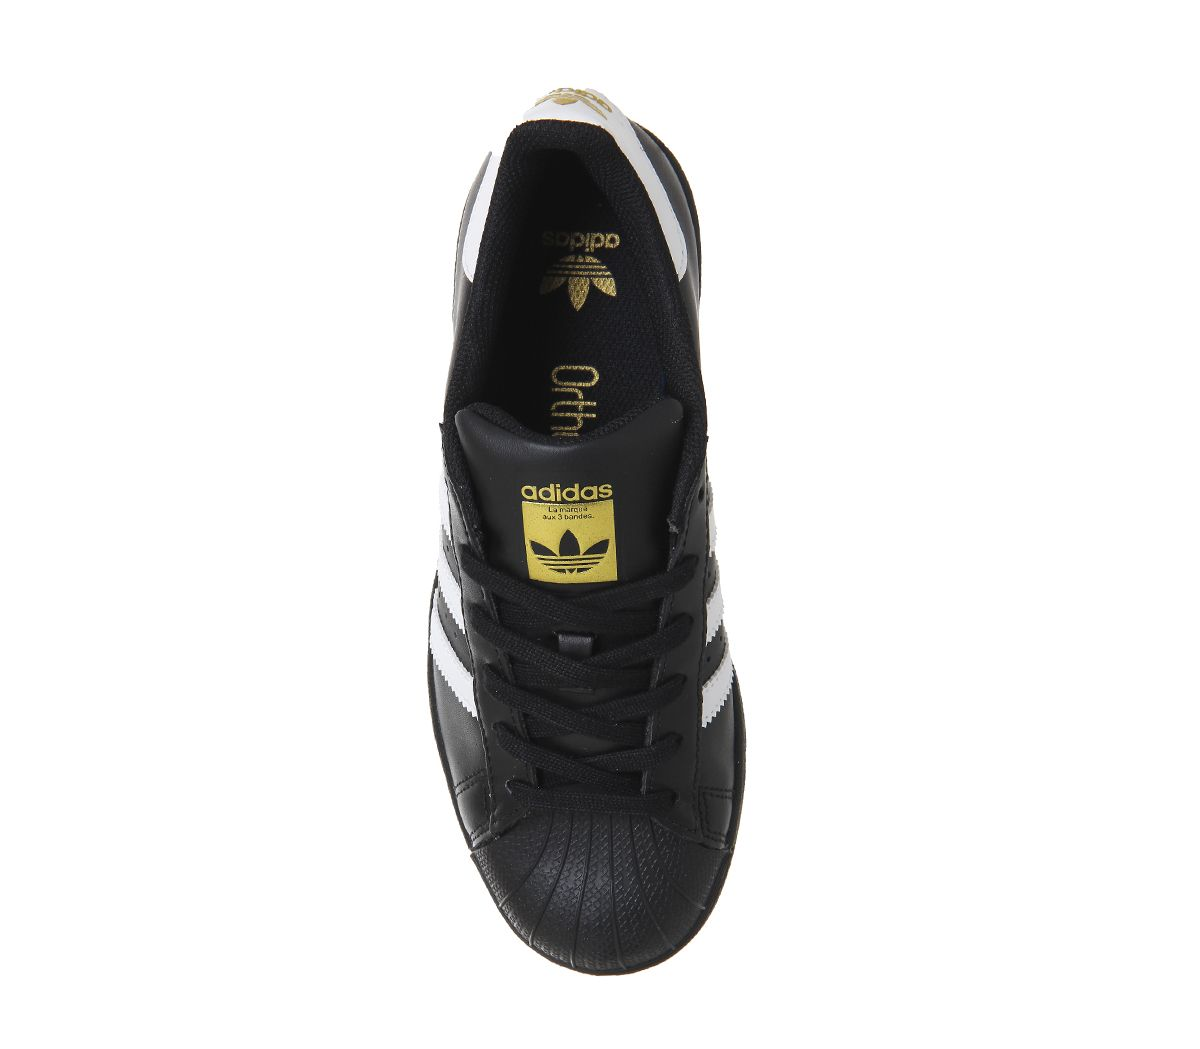 dea49bbfc92 Adidas-Superstar-1-Negro-Blanco-Foundation-Zapatillas-Zapatos miniatura